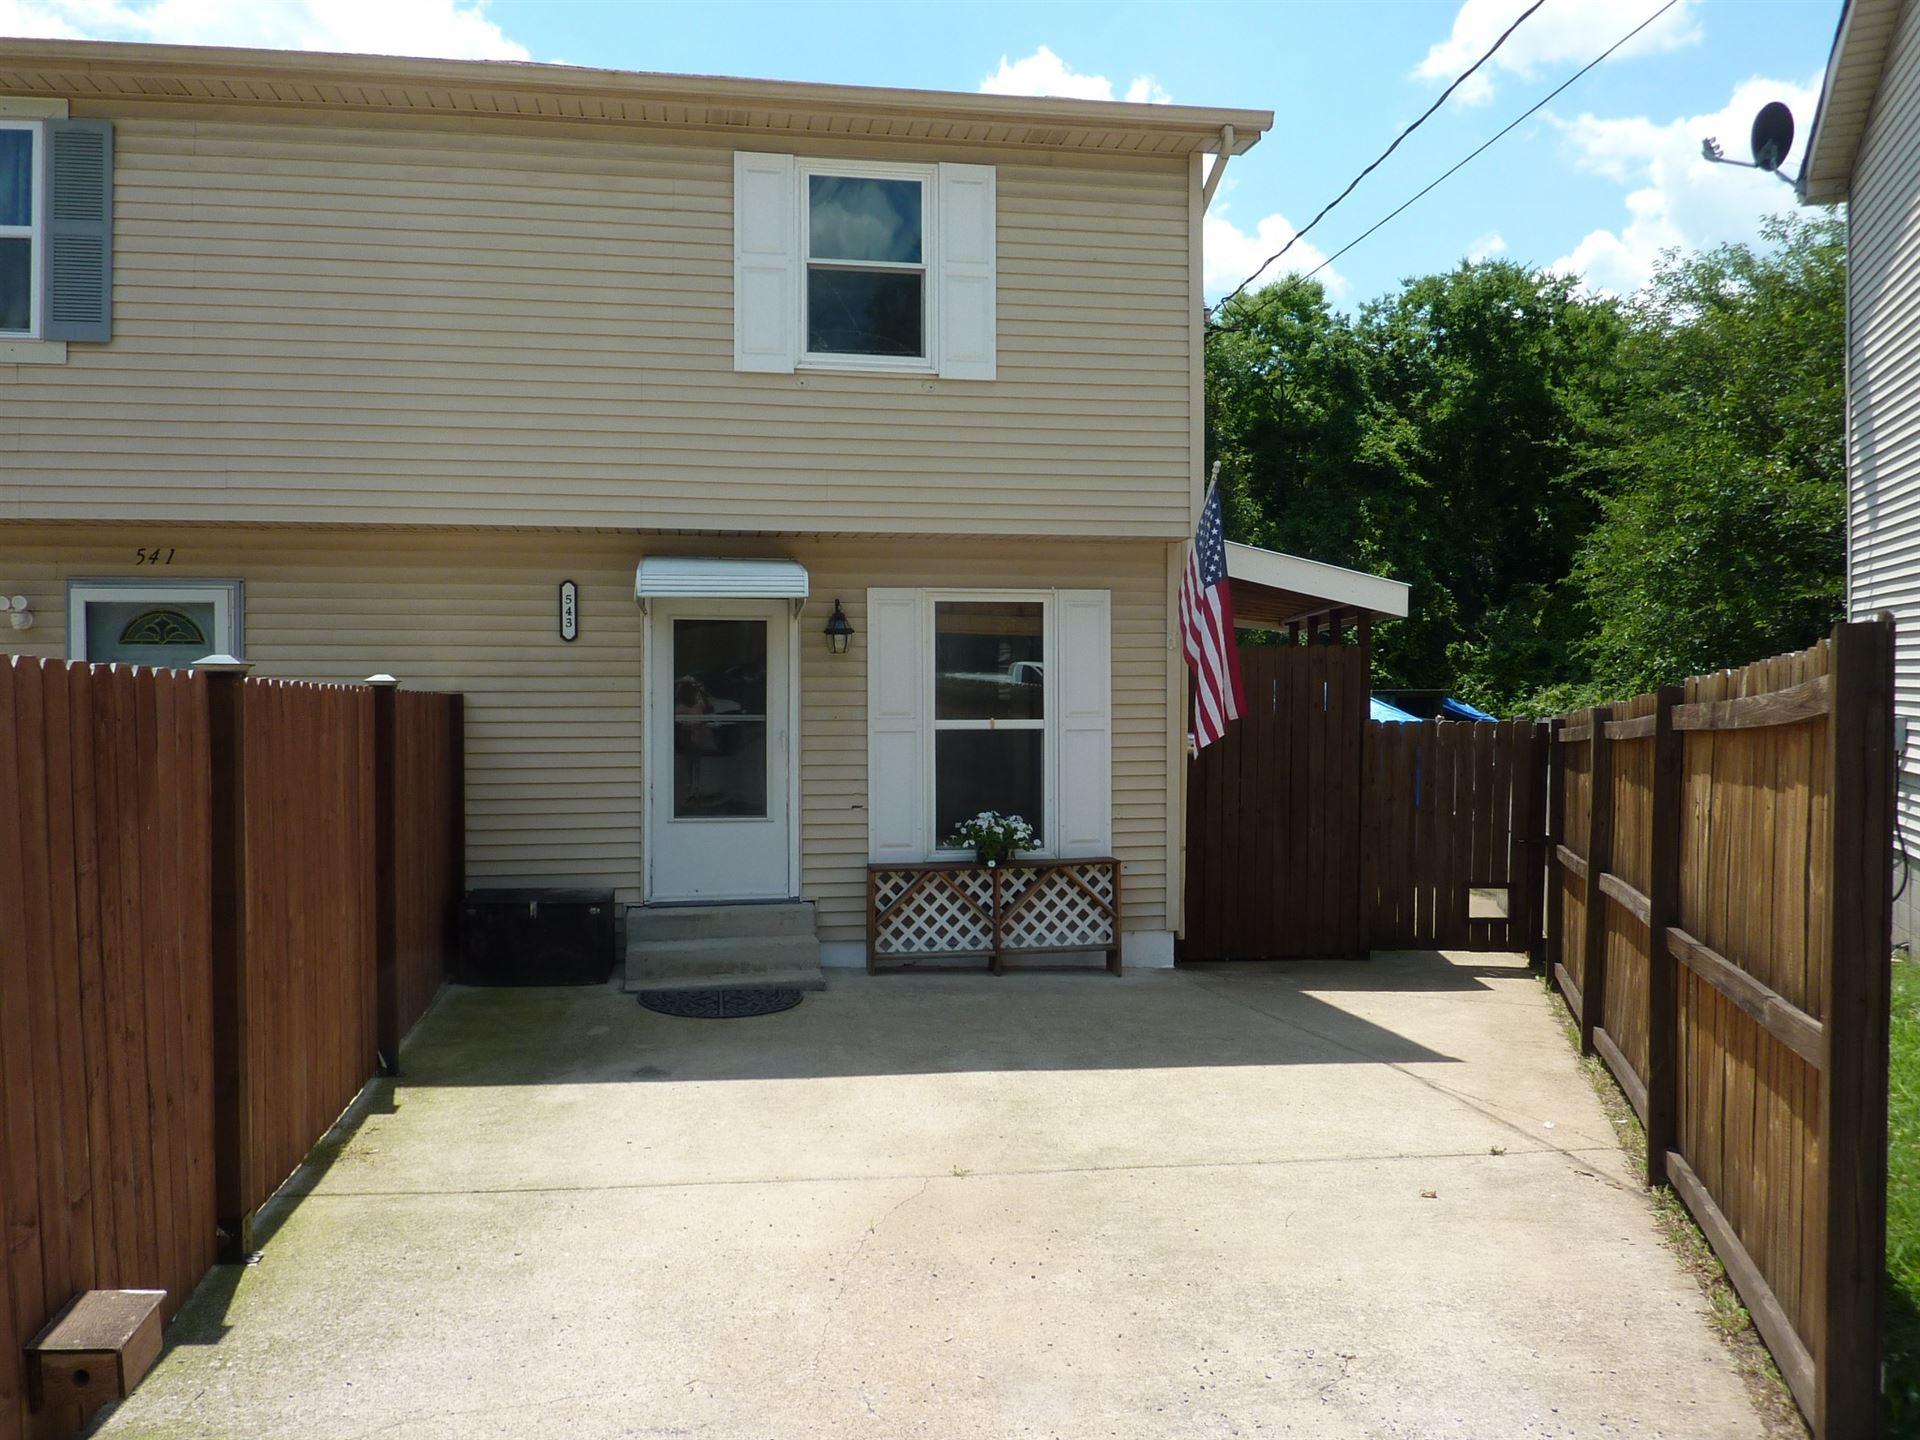 Photo of 543 Drake Ave, Nashville, TN 37211 (MLS # 2263578)